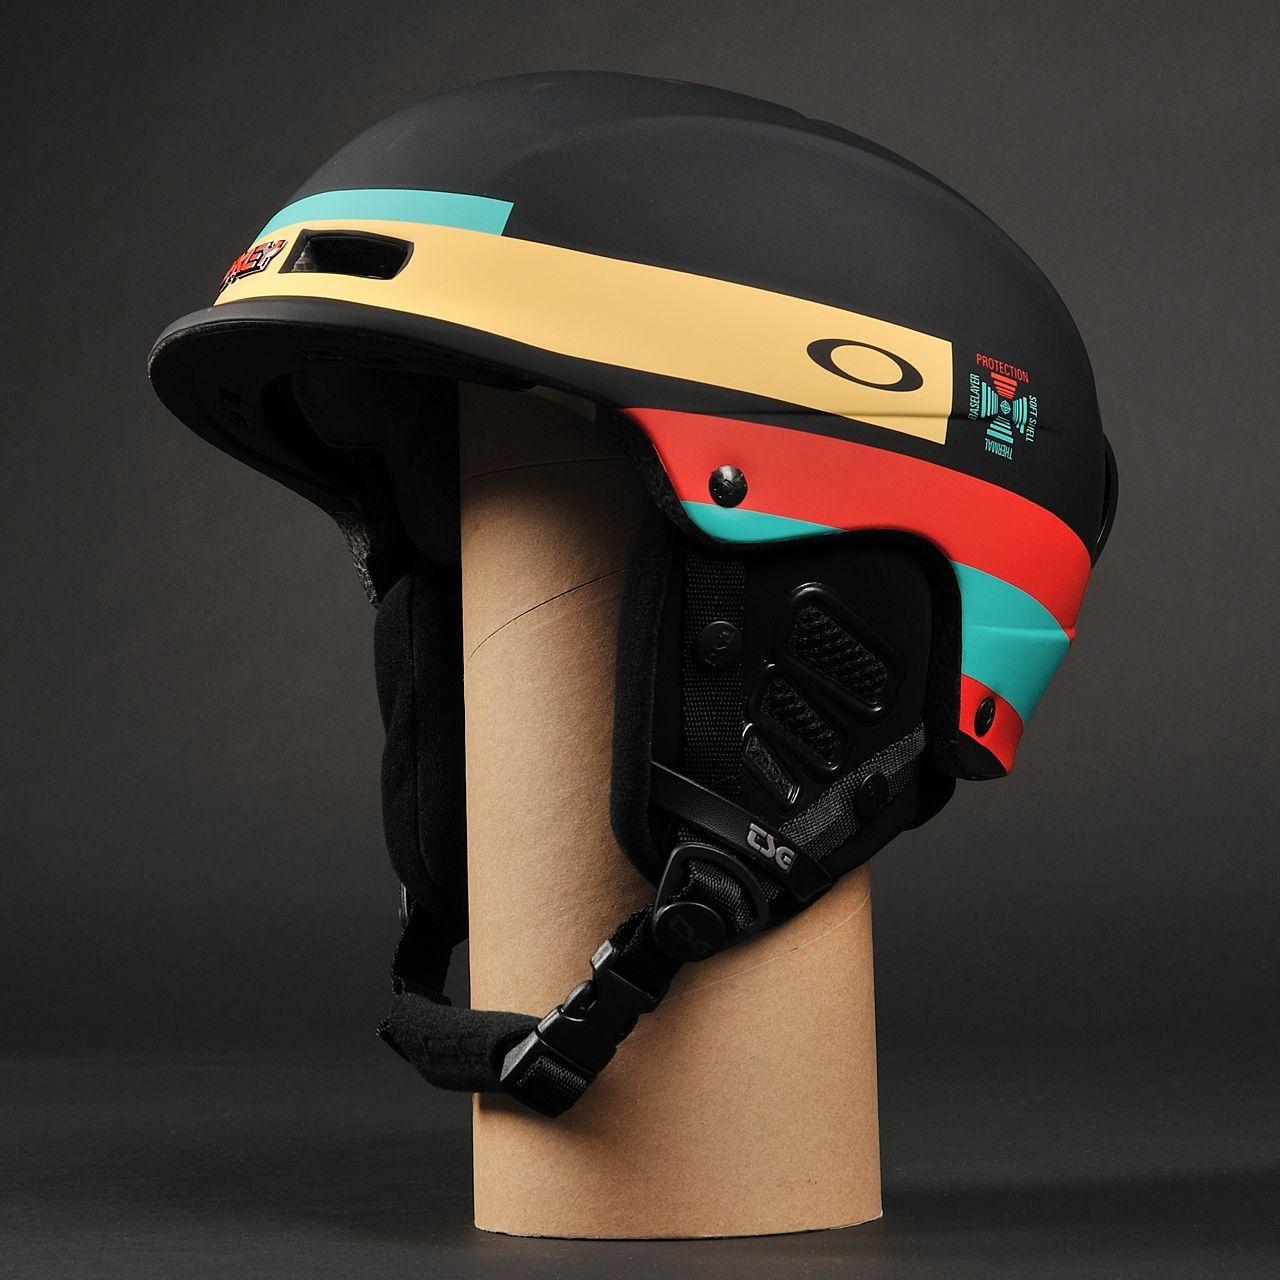 Oakley Modular Helmet - TSG_OakleyModularSystemHelmetCinderOrange_2HQ.jpg